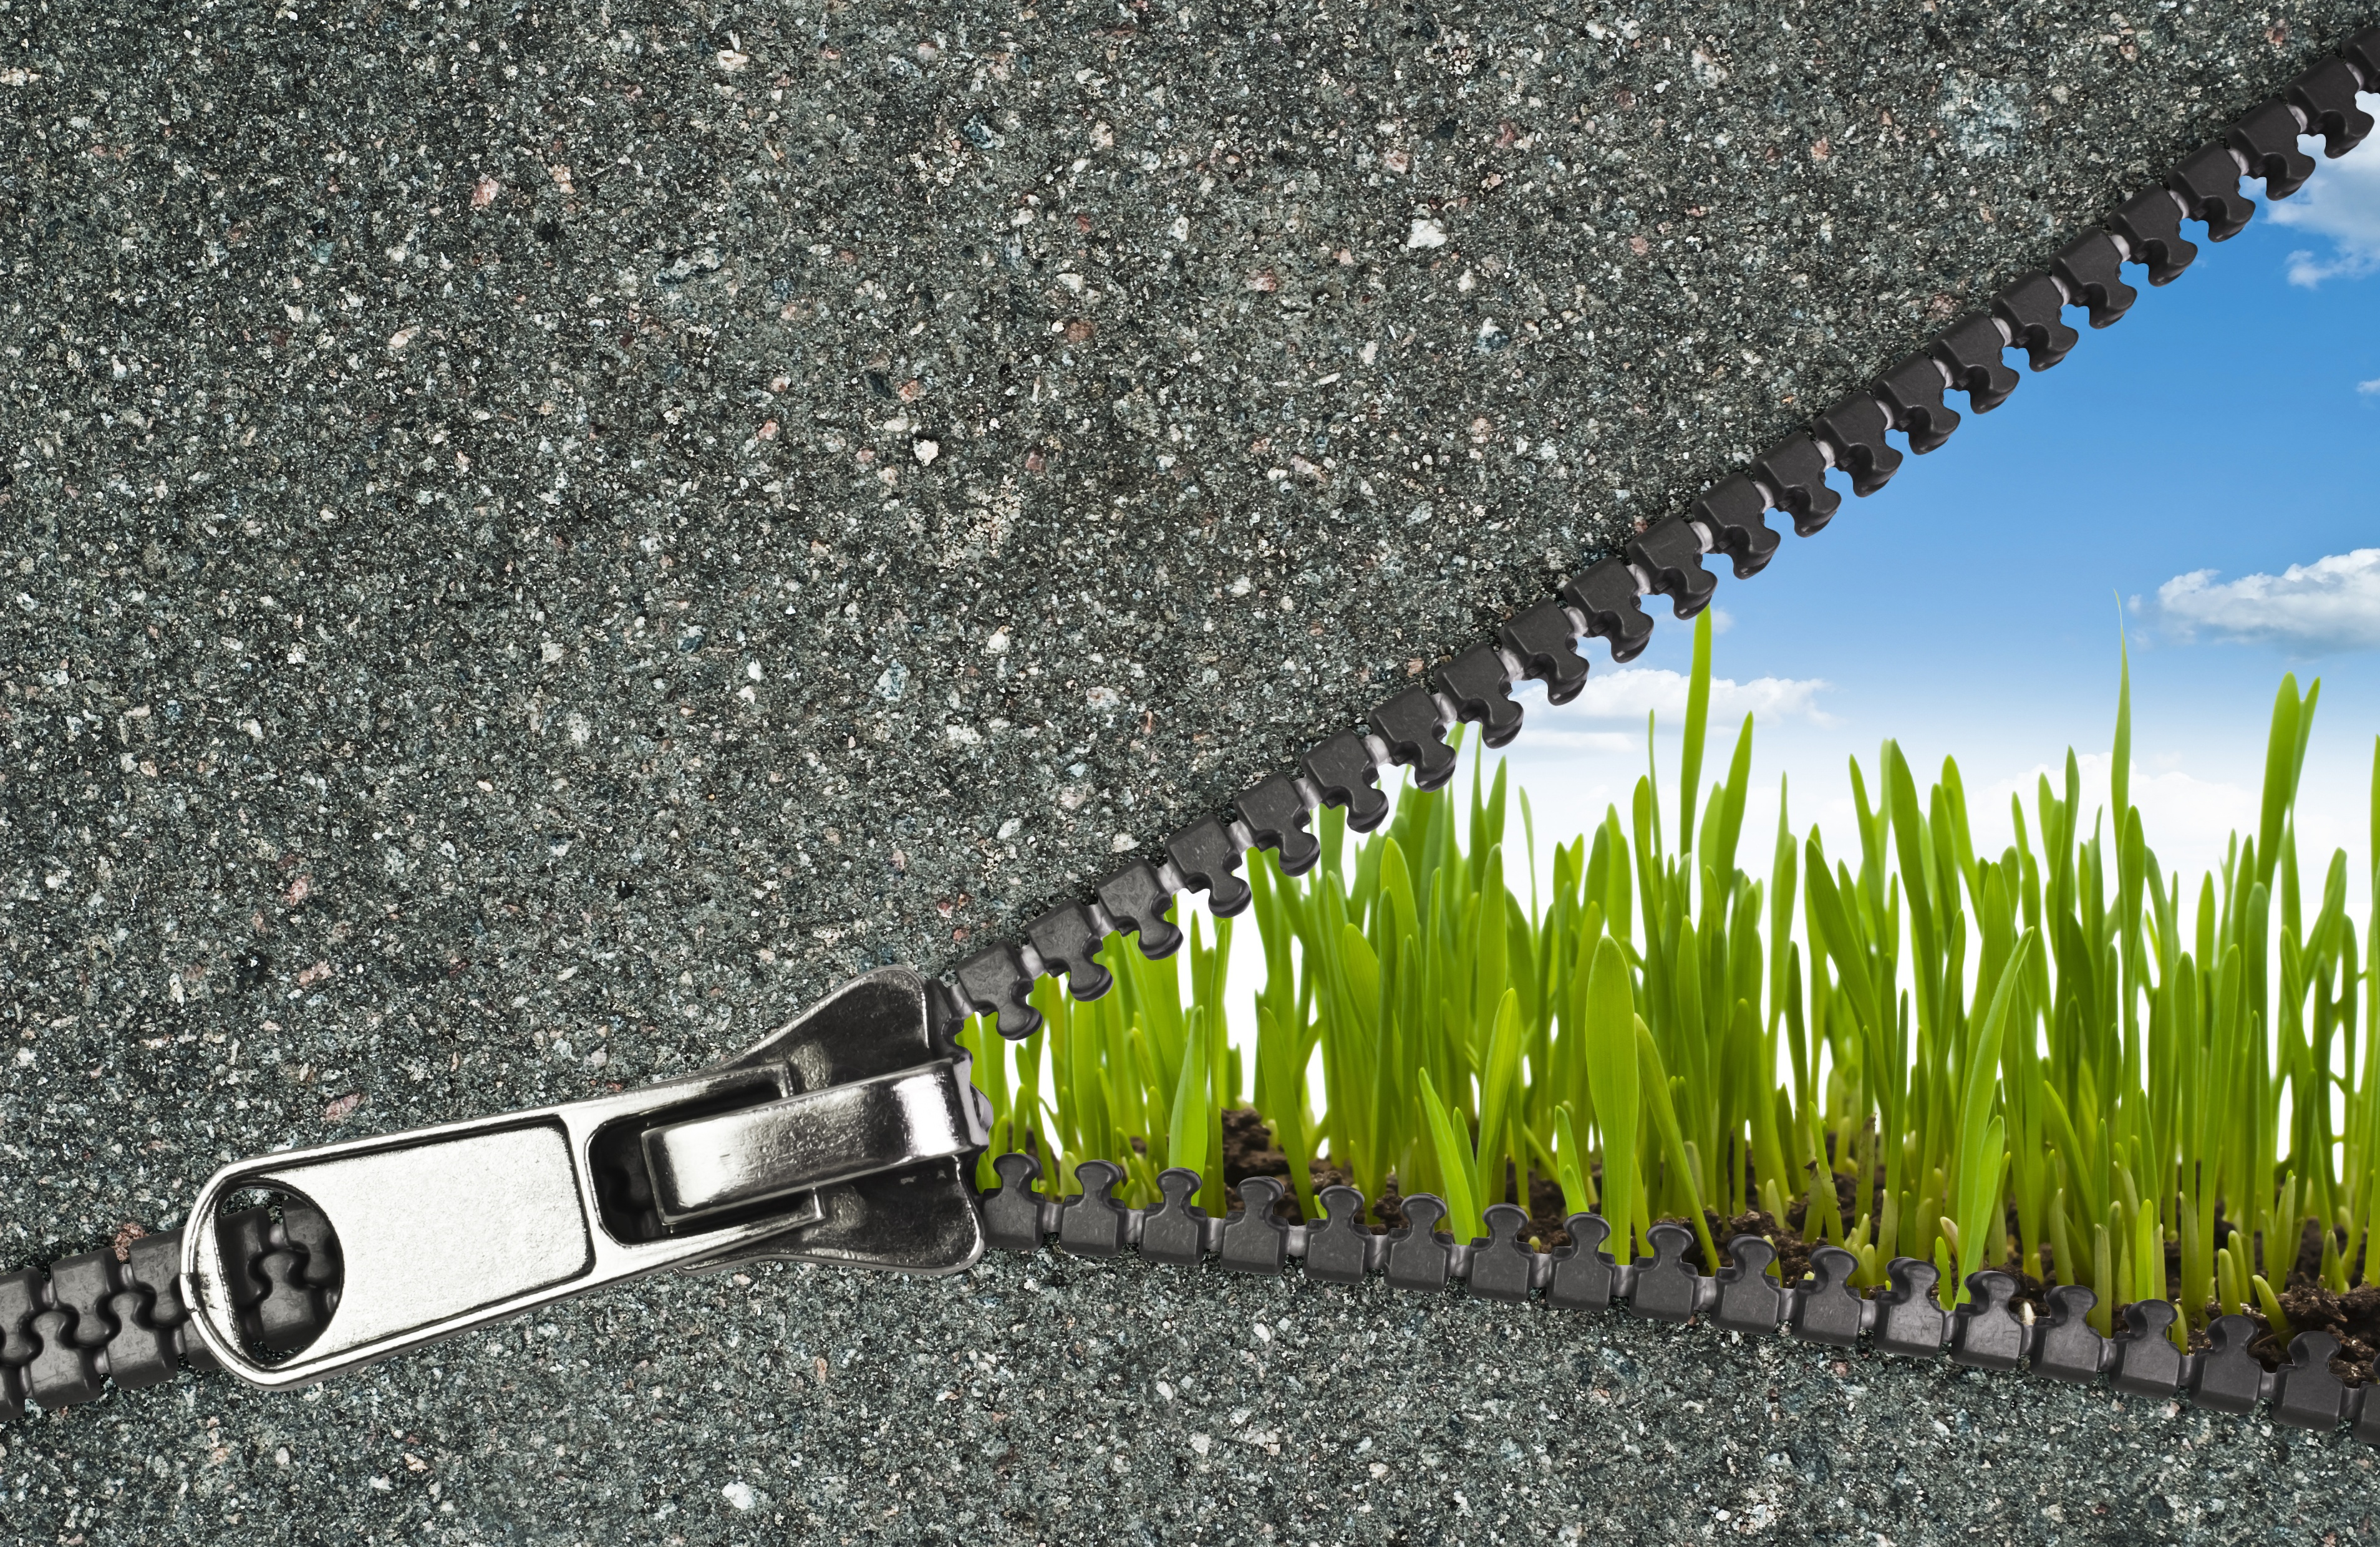 zipper image-1.jpeg